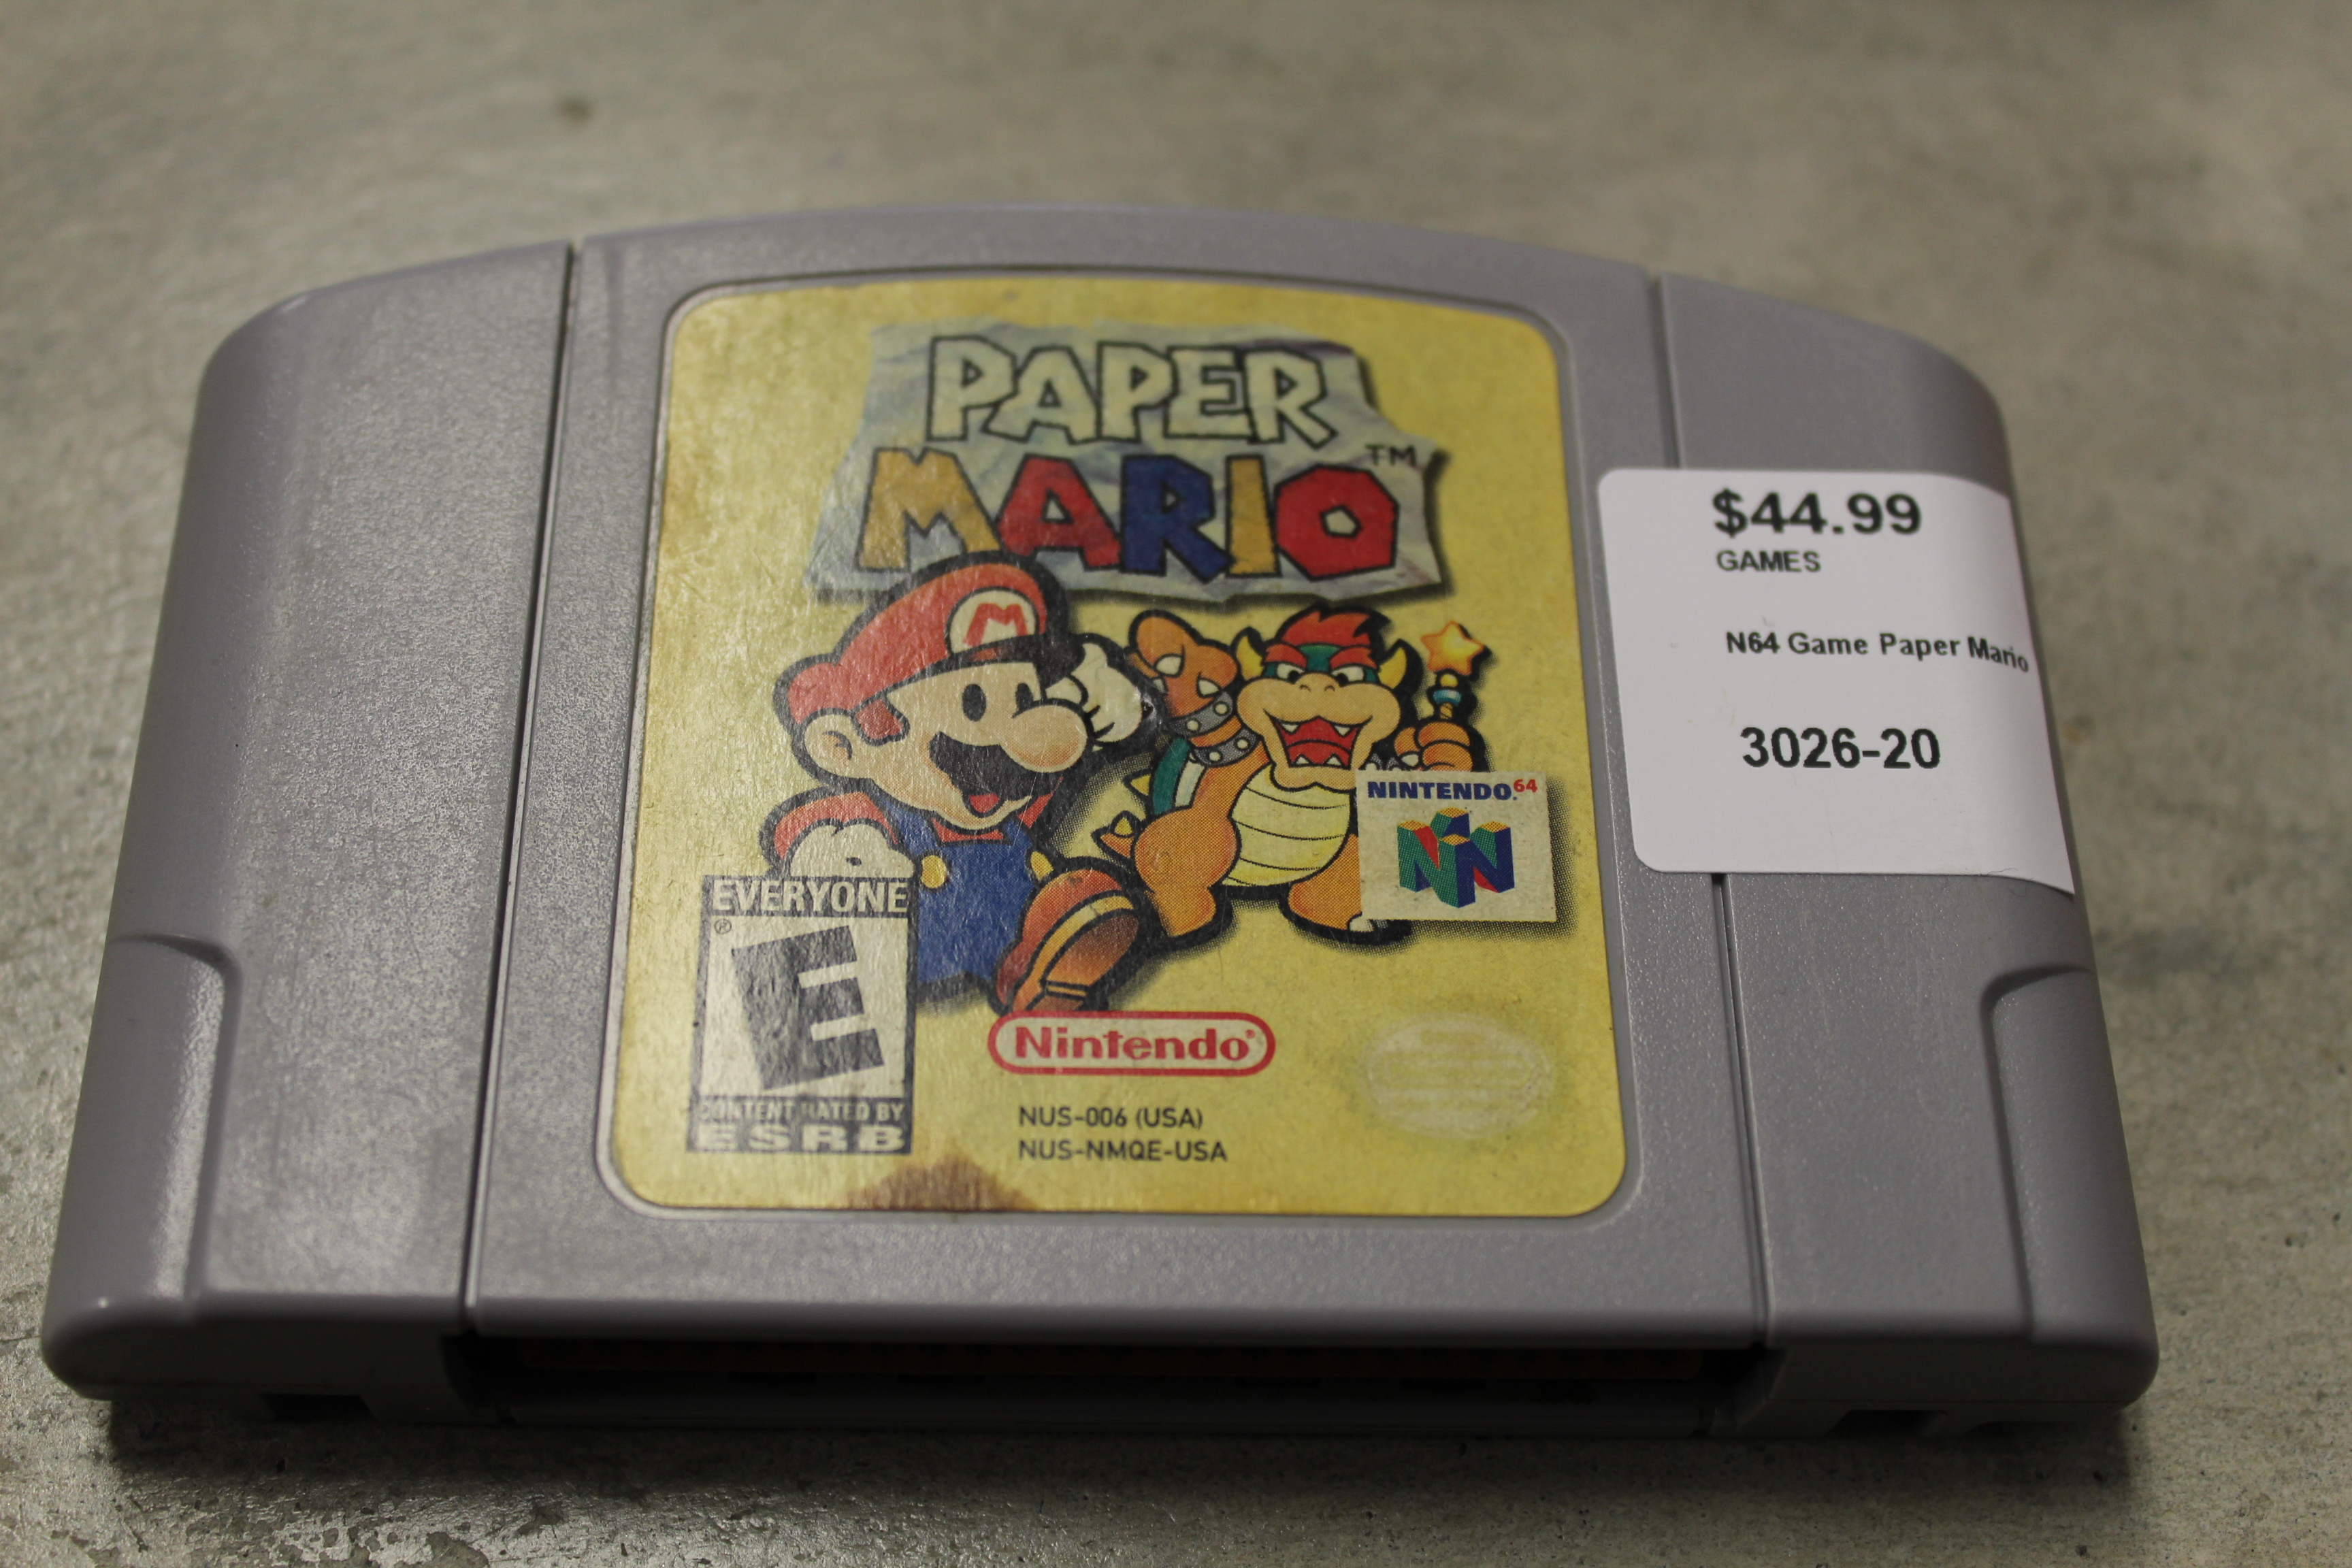 N64 Game Paper Mario